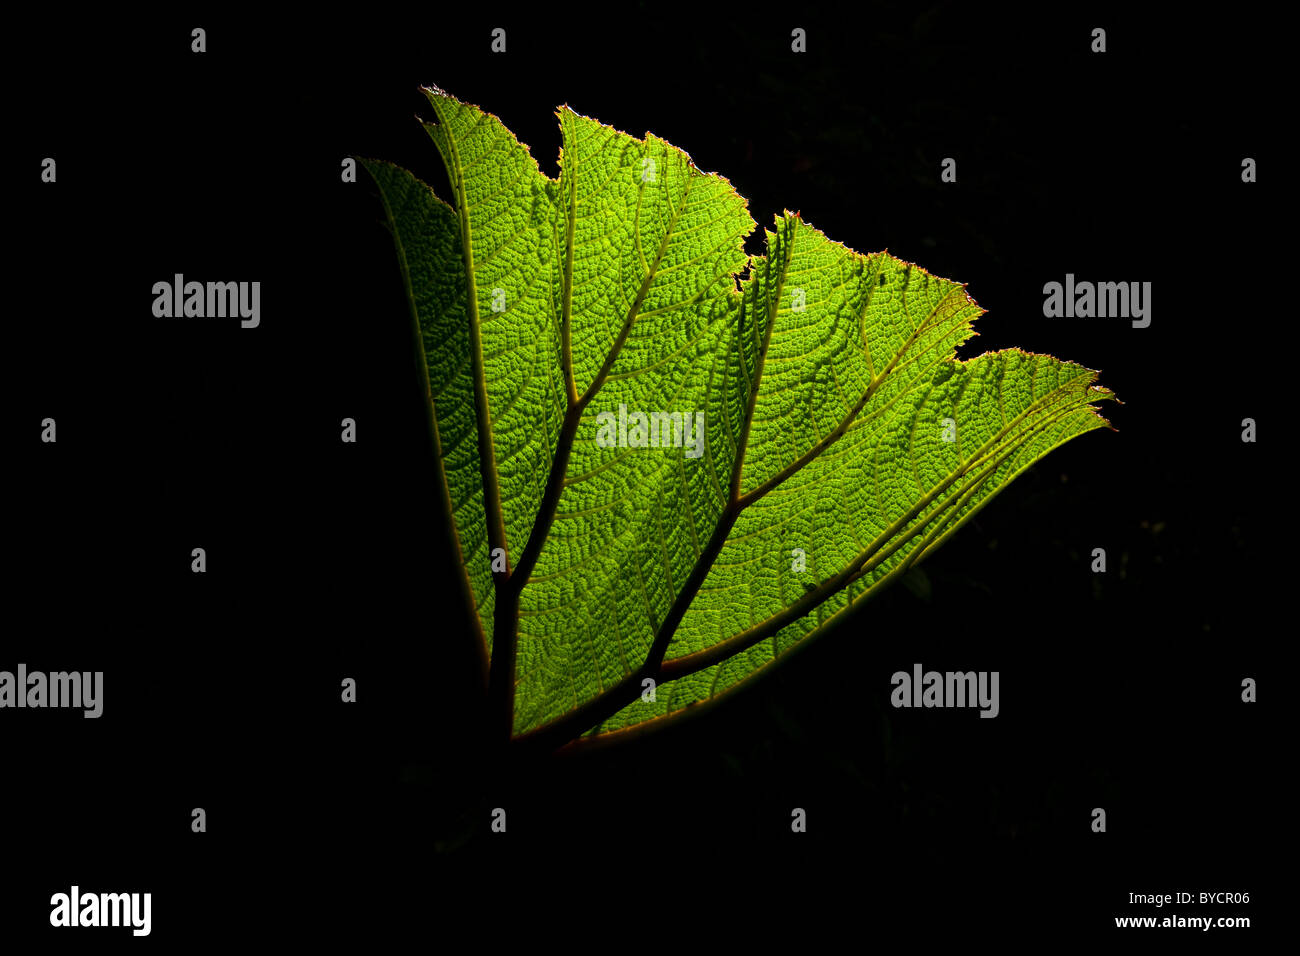 Unfolding leaf in La Amistad national park, Chiriqui province, Republic of Panama. Stock Photo